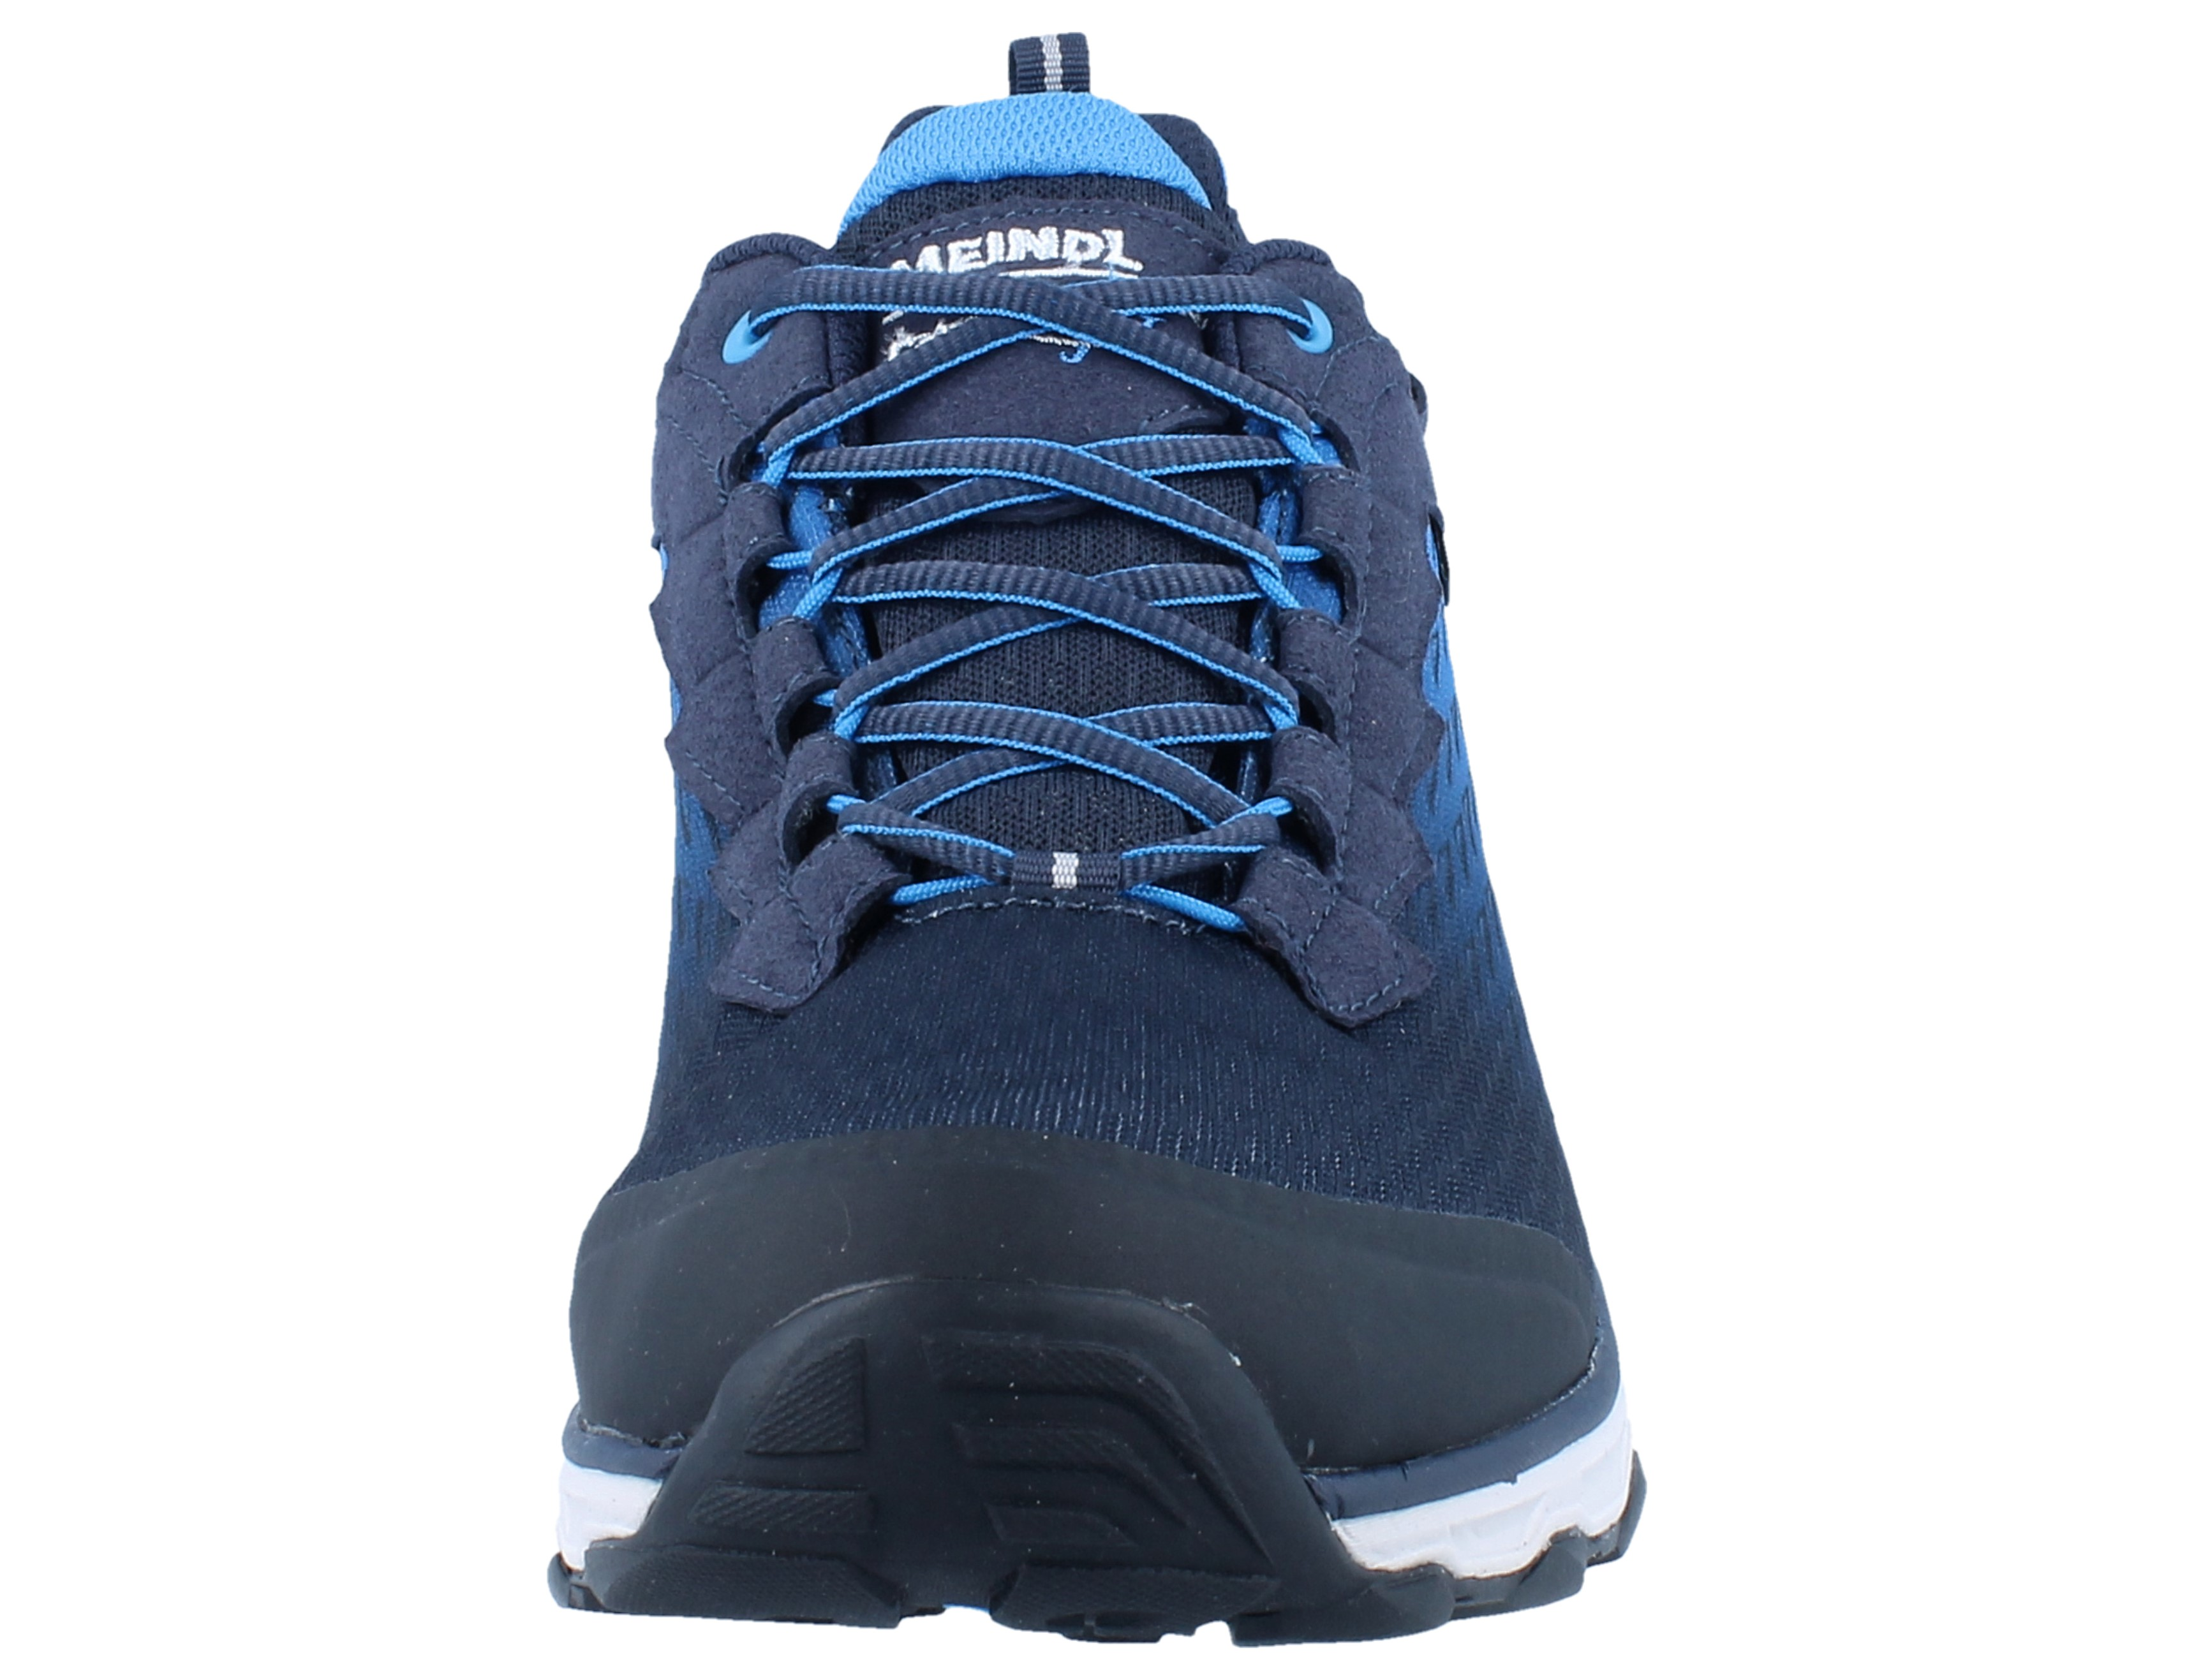 MEINDL Activo Sport GTX marineblau VentilationMesh